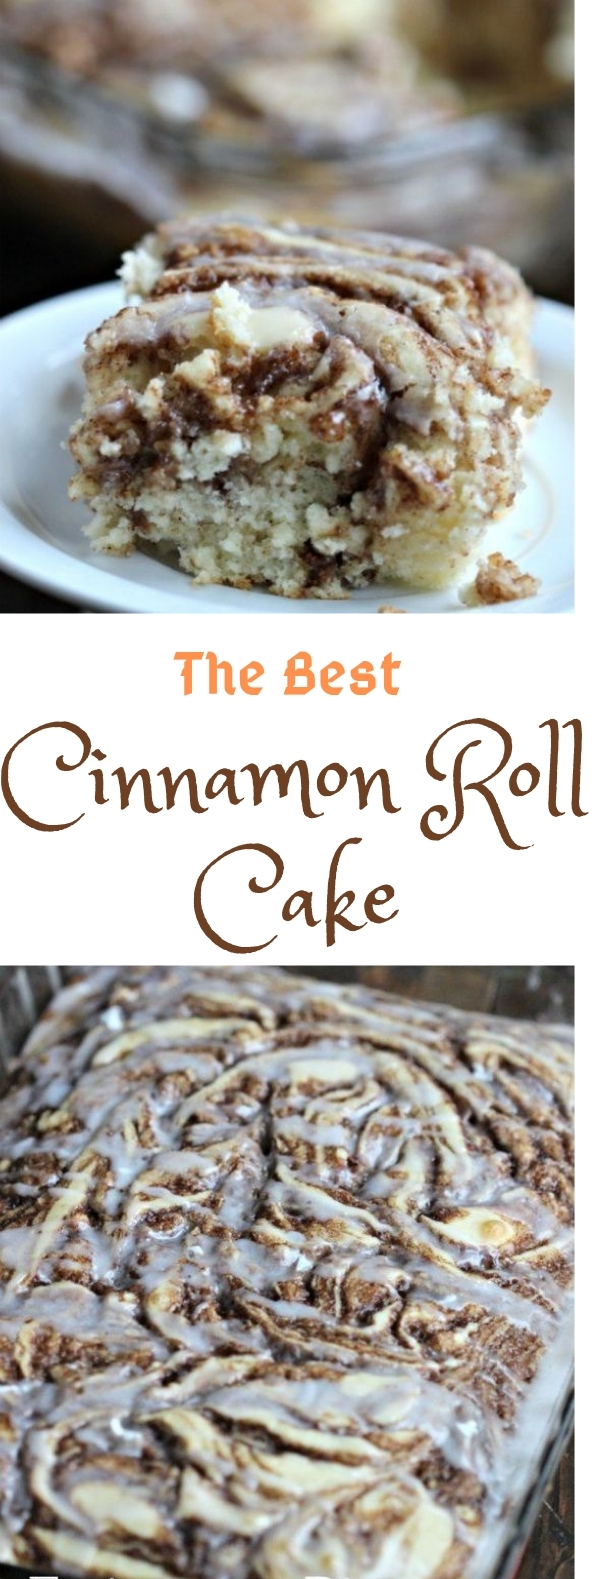 THE BEST CINNAMON ROLL CAKE RECIPE #easyrecipe #rollcake